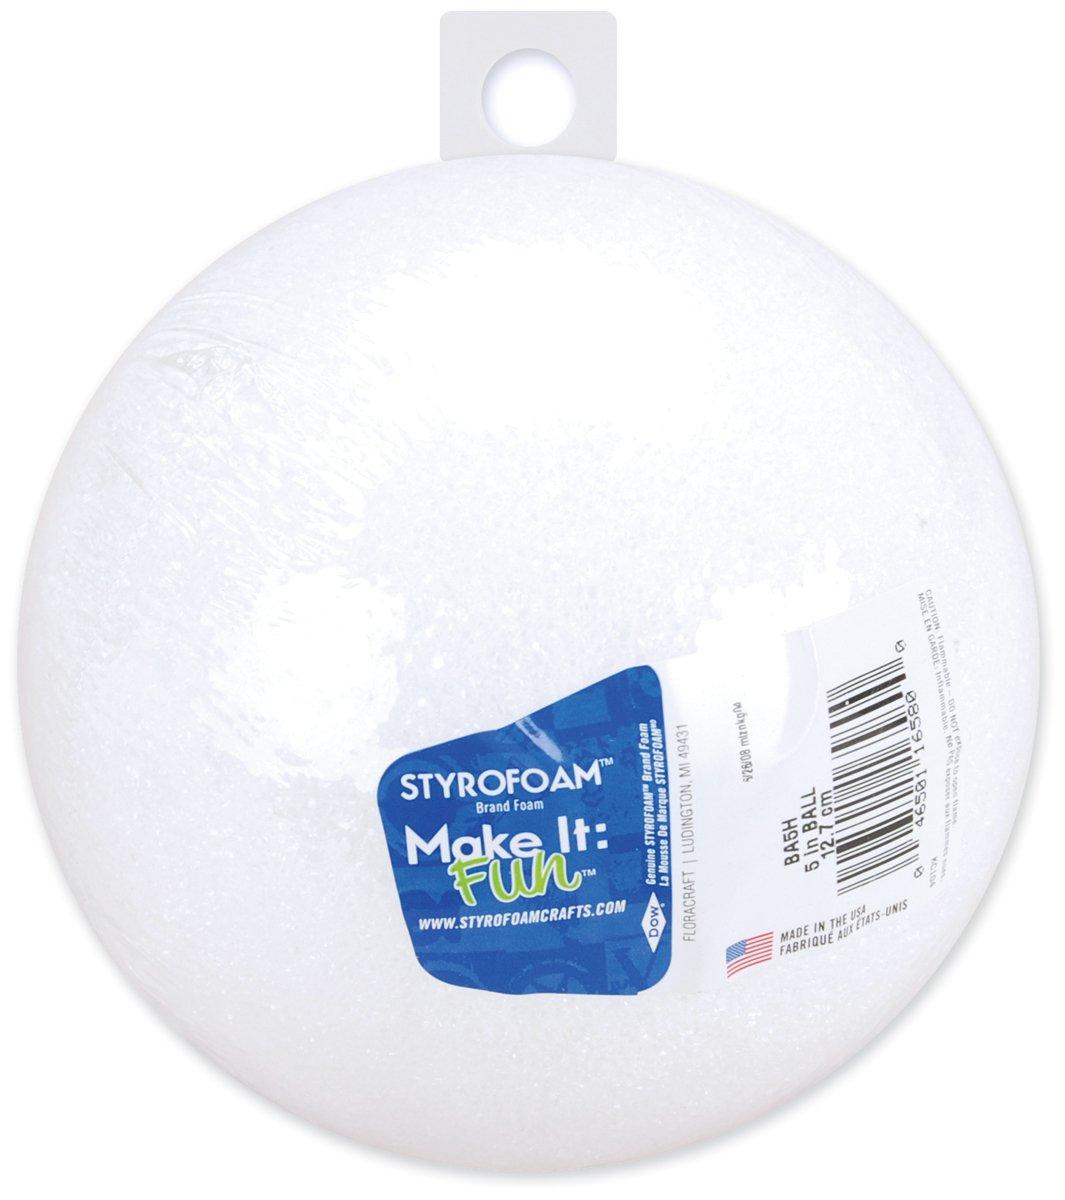 Floracraft Styrofoam Ball, 5-Inch, White, 1-Pack